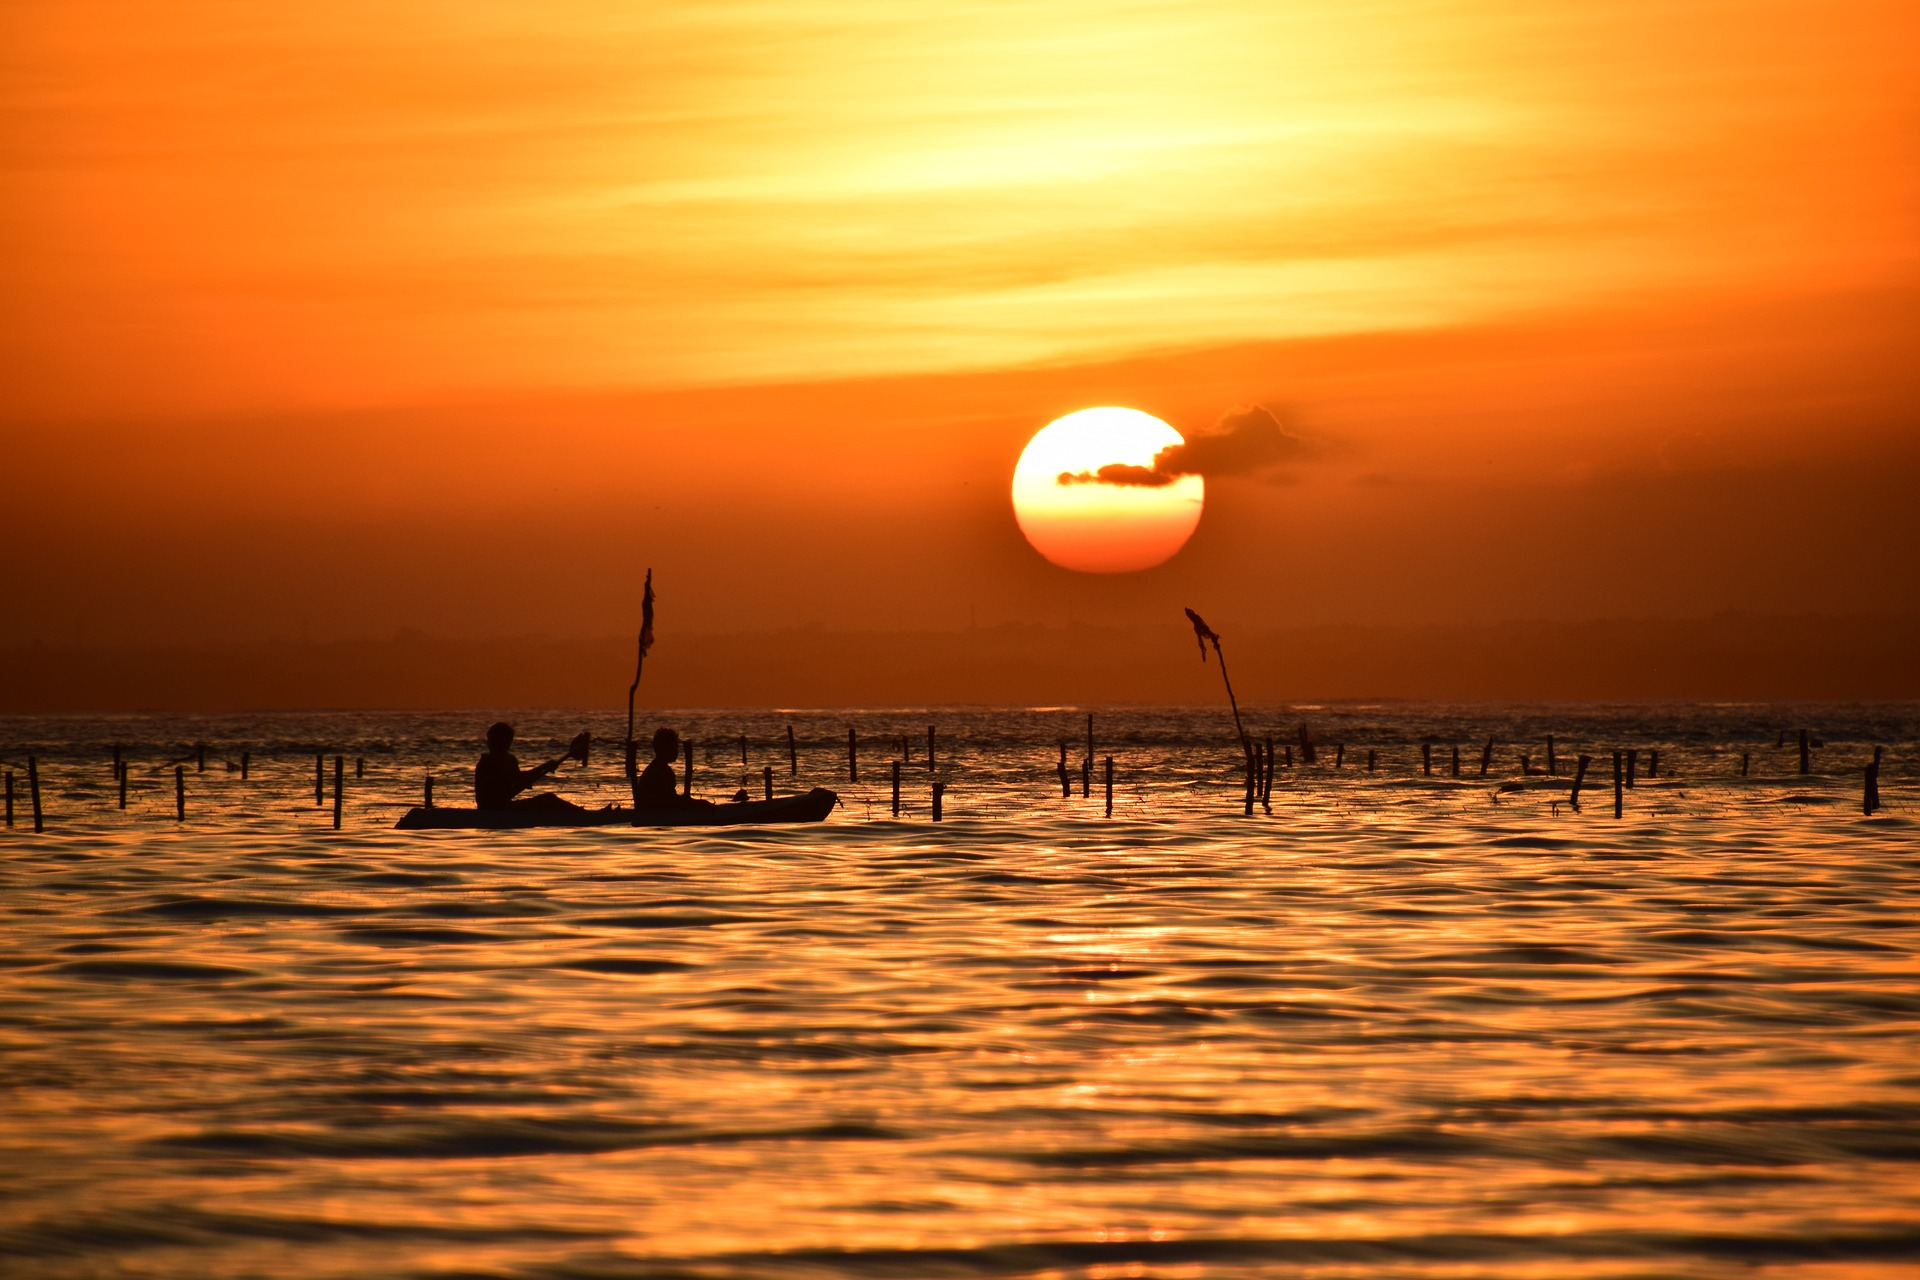 Bali beach sunset